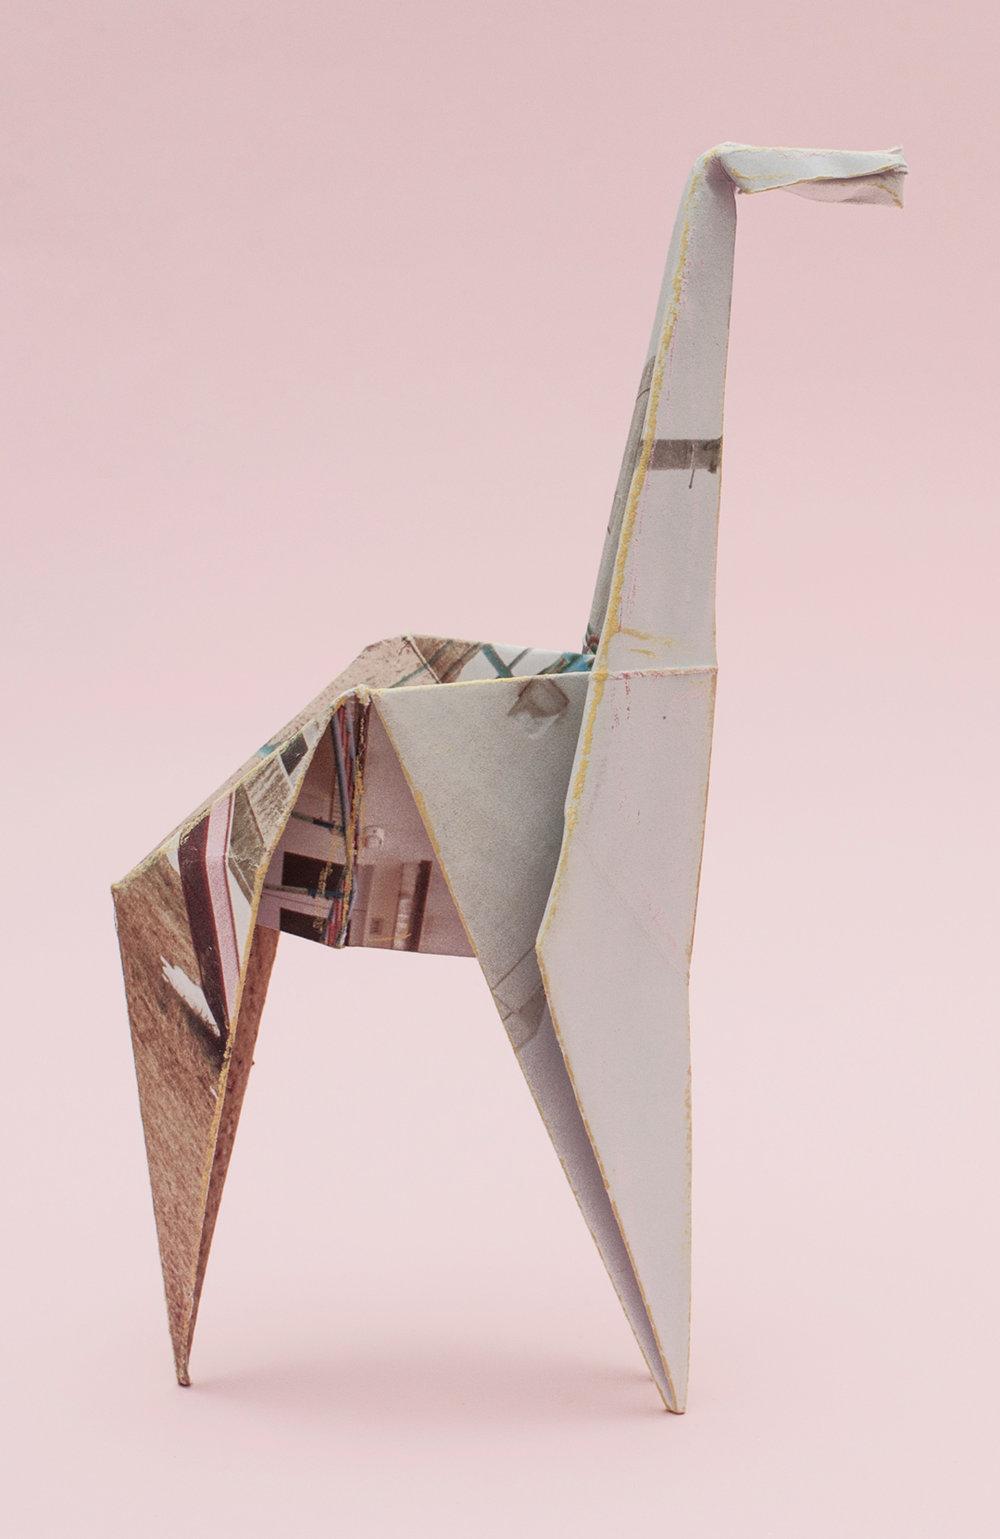 Playground-as-Folded-Origami-Object_Carine-Thevenau.jpg